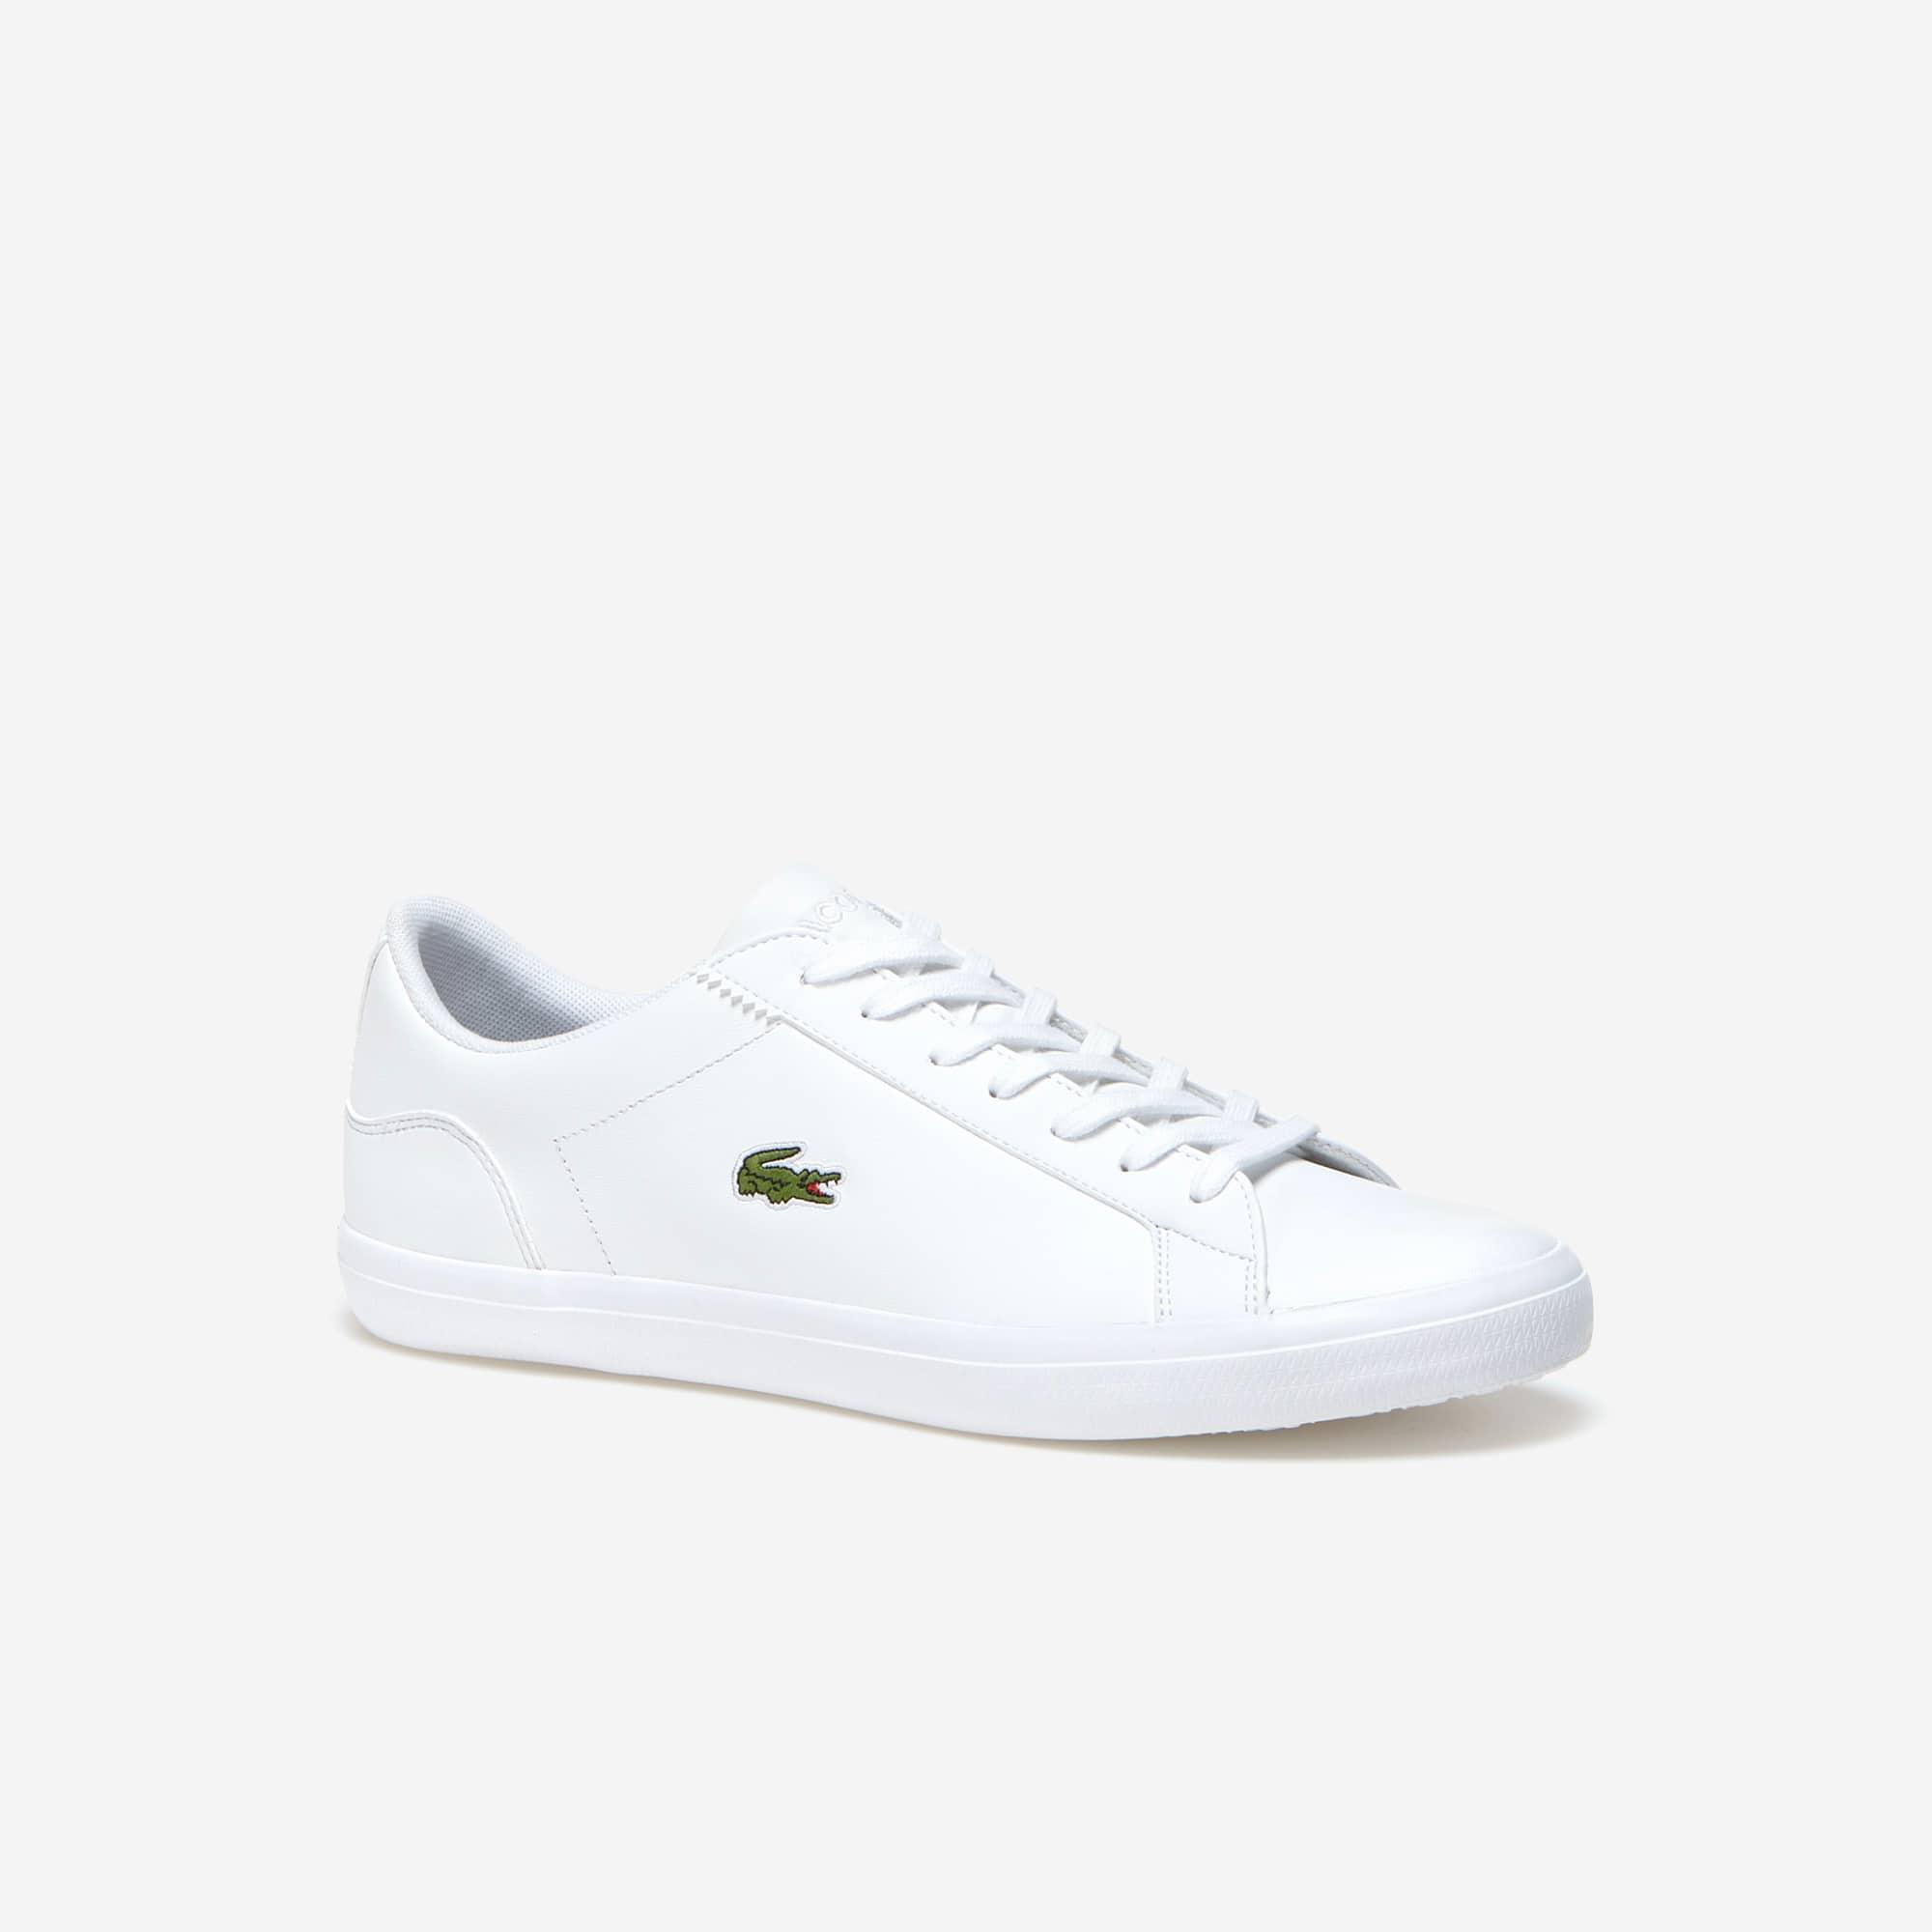 Lerond Aus Leder Herren Sneakers Herren 5L4qjAR3